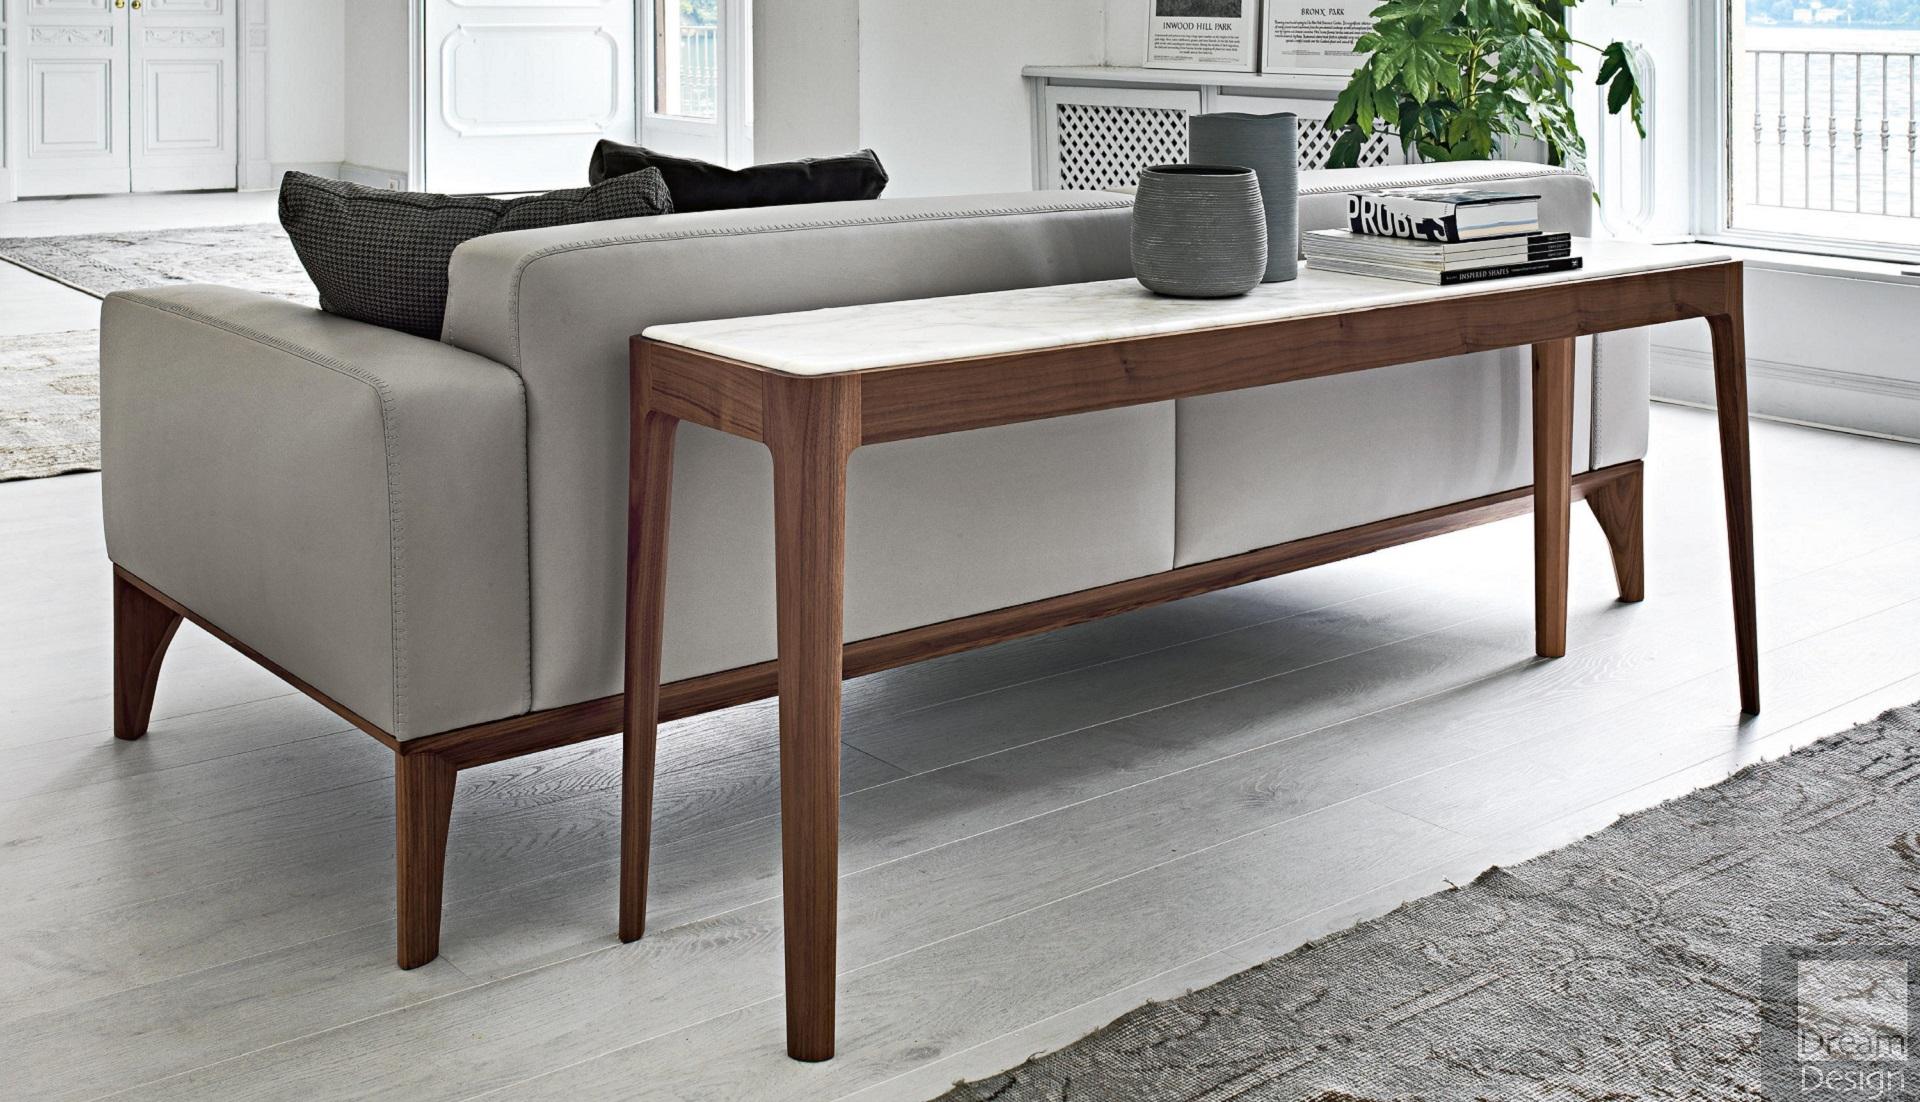 Porada Ziggy 4 Console Table - Dream Design Interiors Ltd